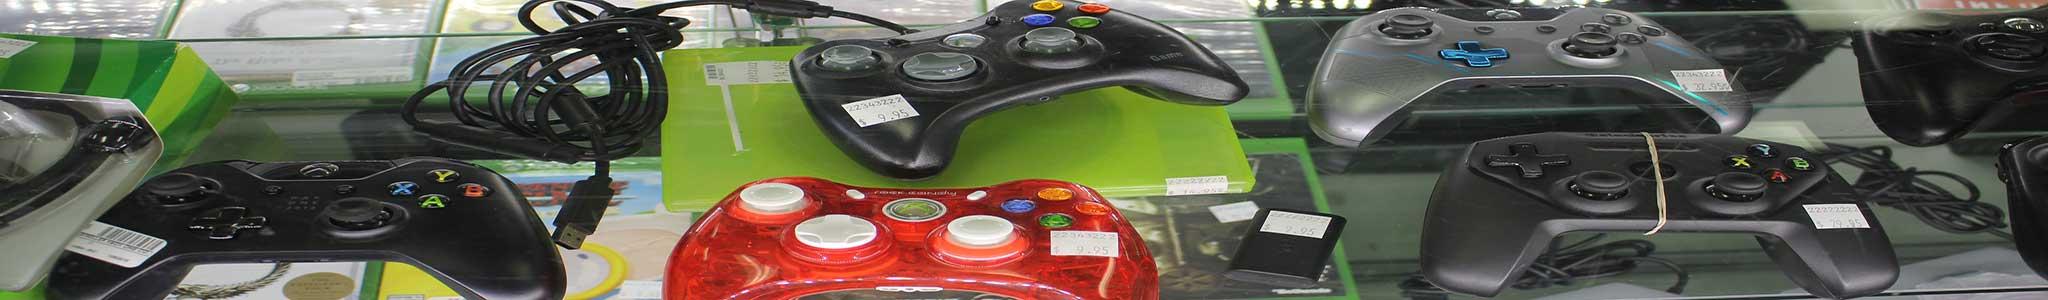 Best Video Games in Ontario California